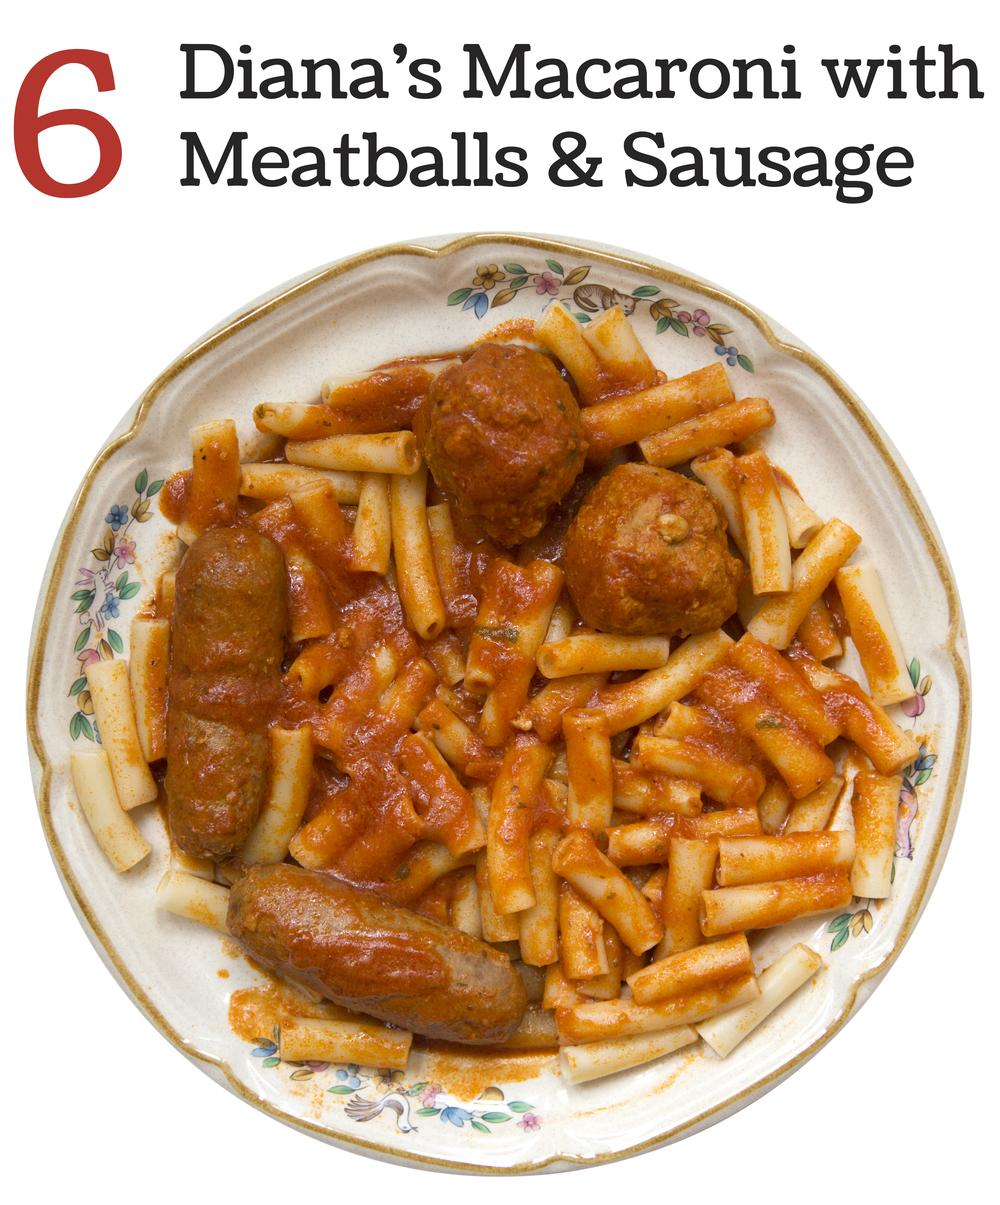 6 Diana's Macaroni with Meatballs & Sausage.jpg